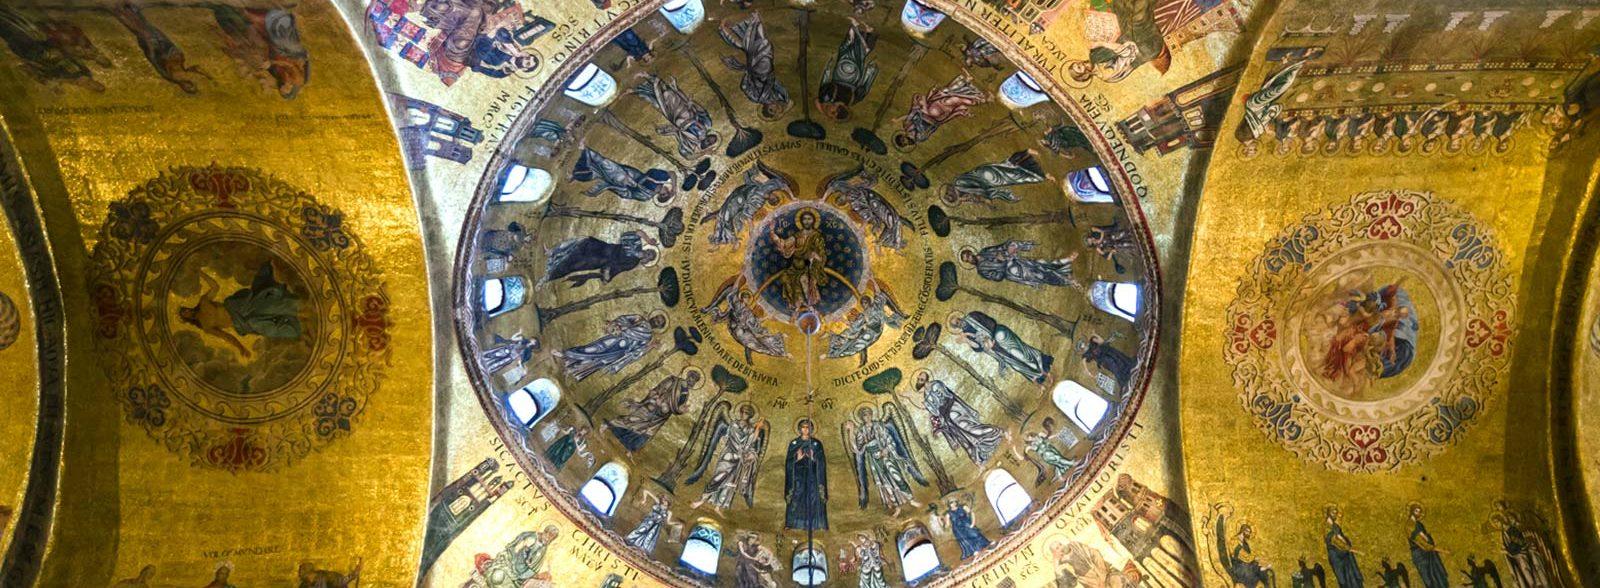 The best St. Mark's Basilica mosaics: discovering a treasure